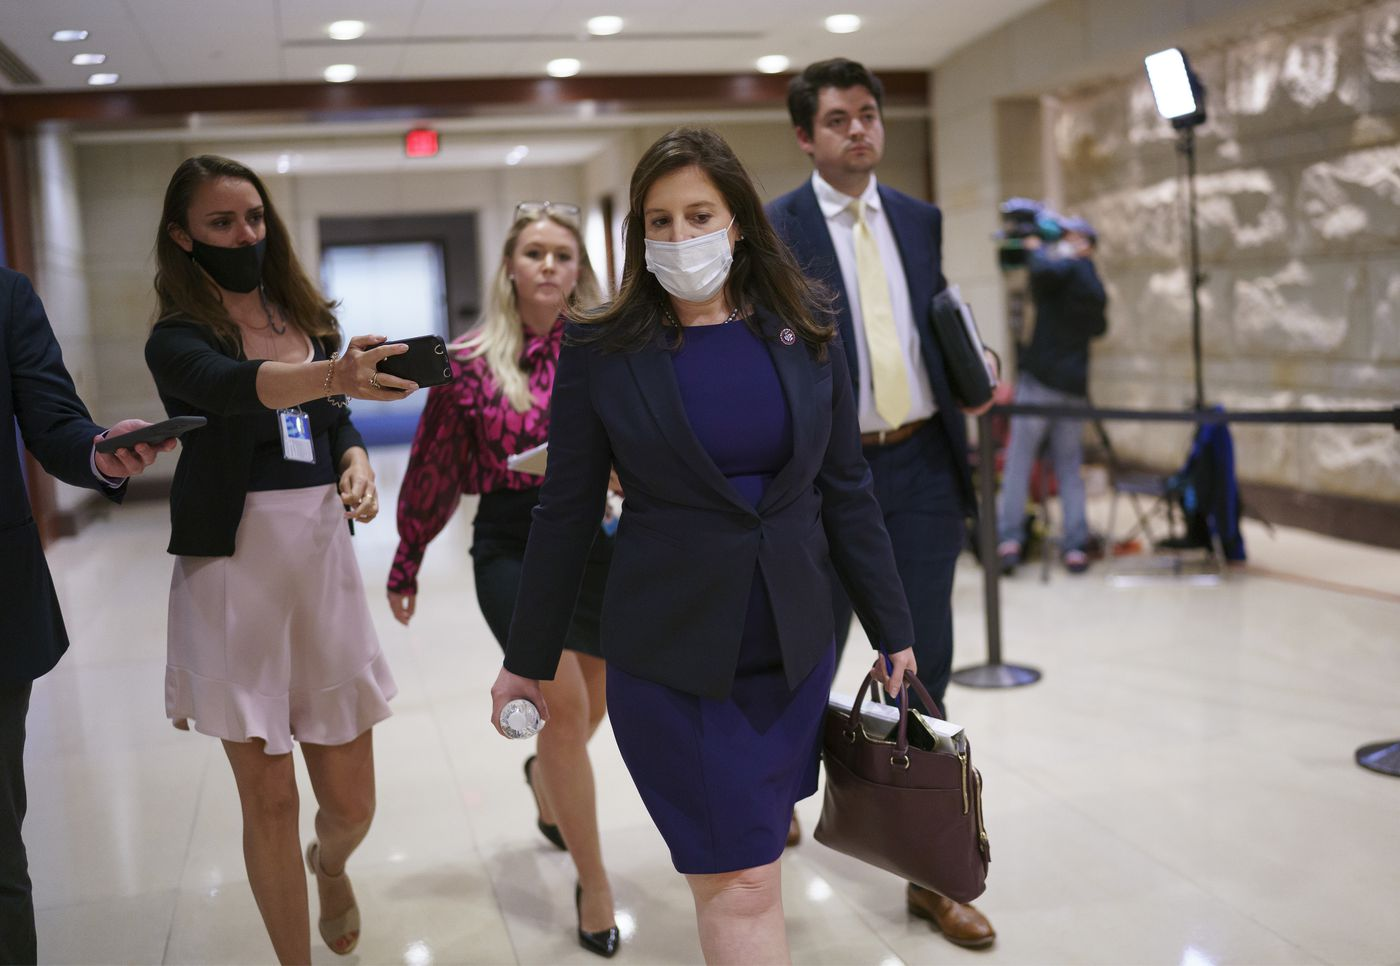 House GOP set to put Trump defender Stefanik into No. 3 post